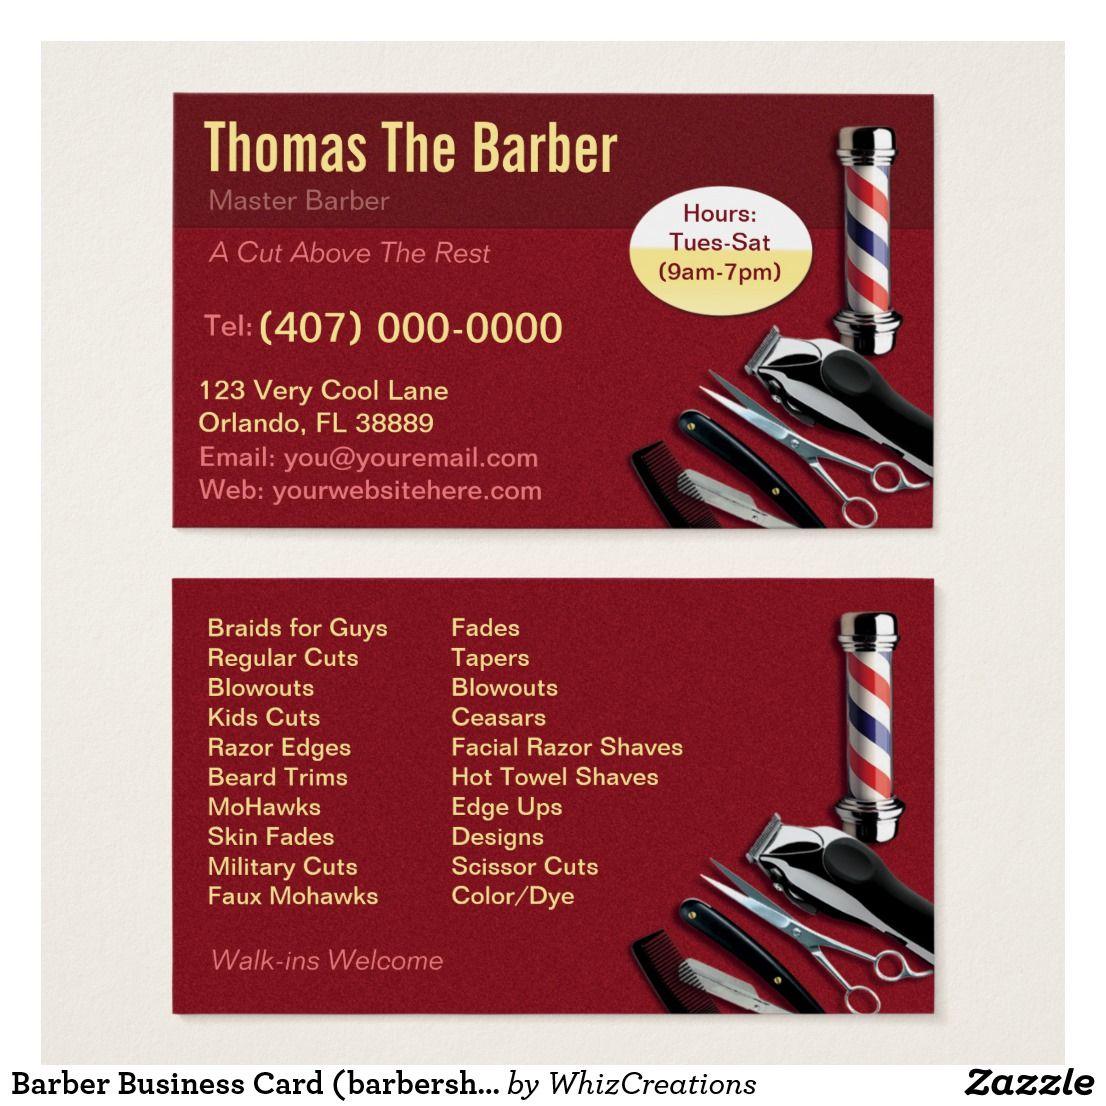 Barber Business Card (barbershop pole - clippers) | Barbershop